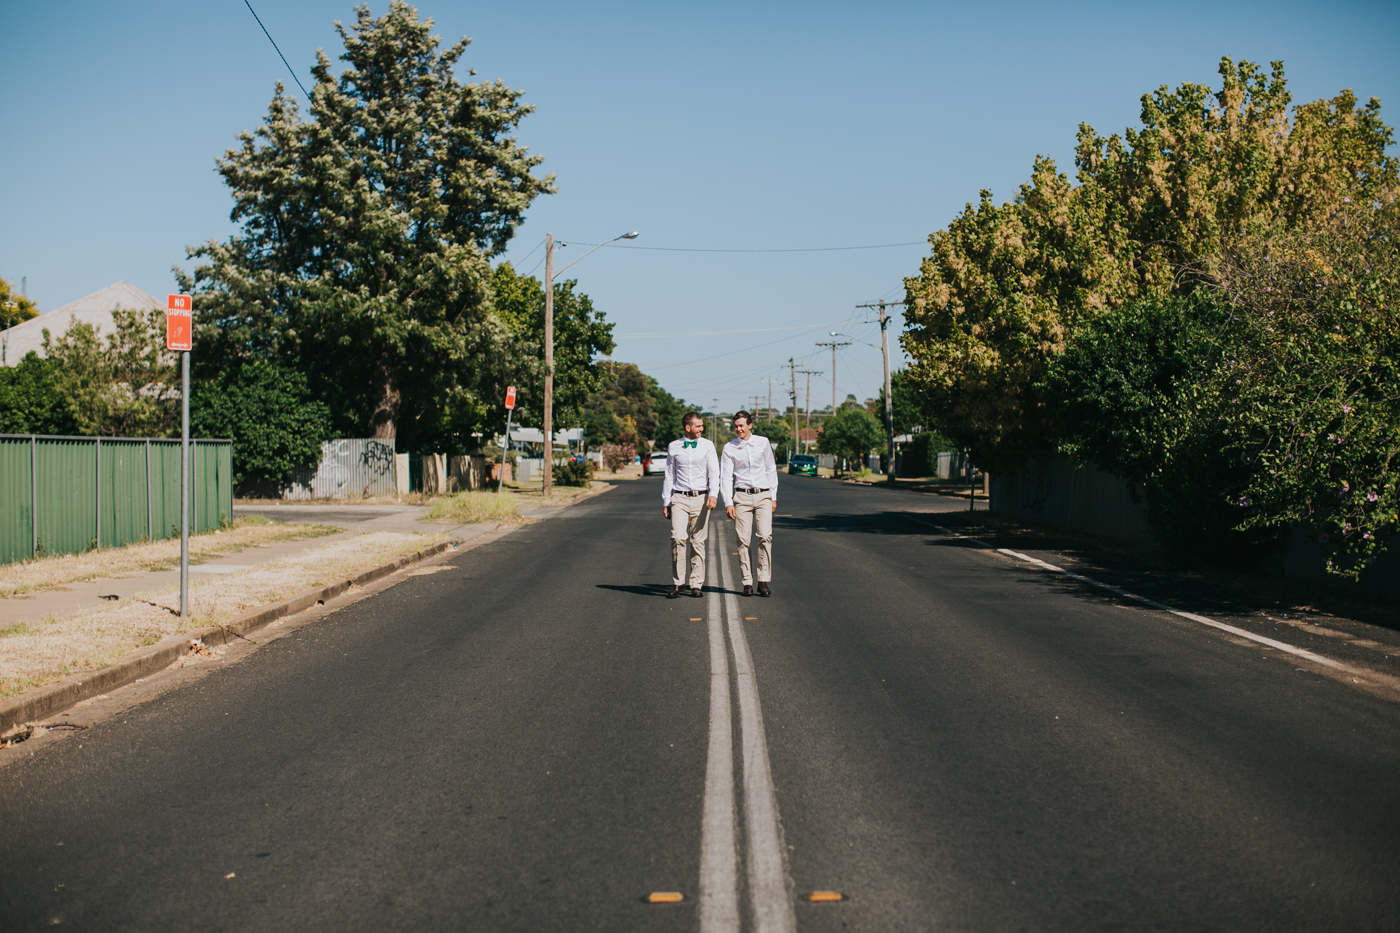 Nicolle & Jacob - Dubbo Wedding - Country Australia - Samantha Heather Photography-27.jpg